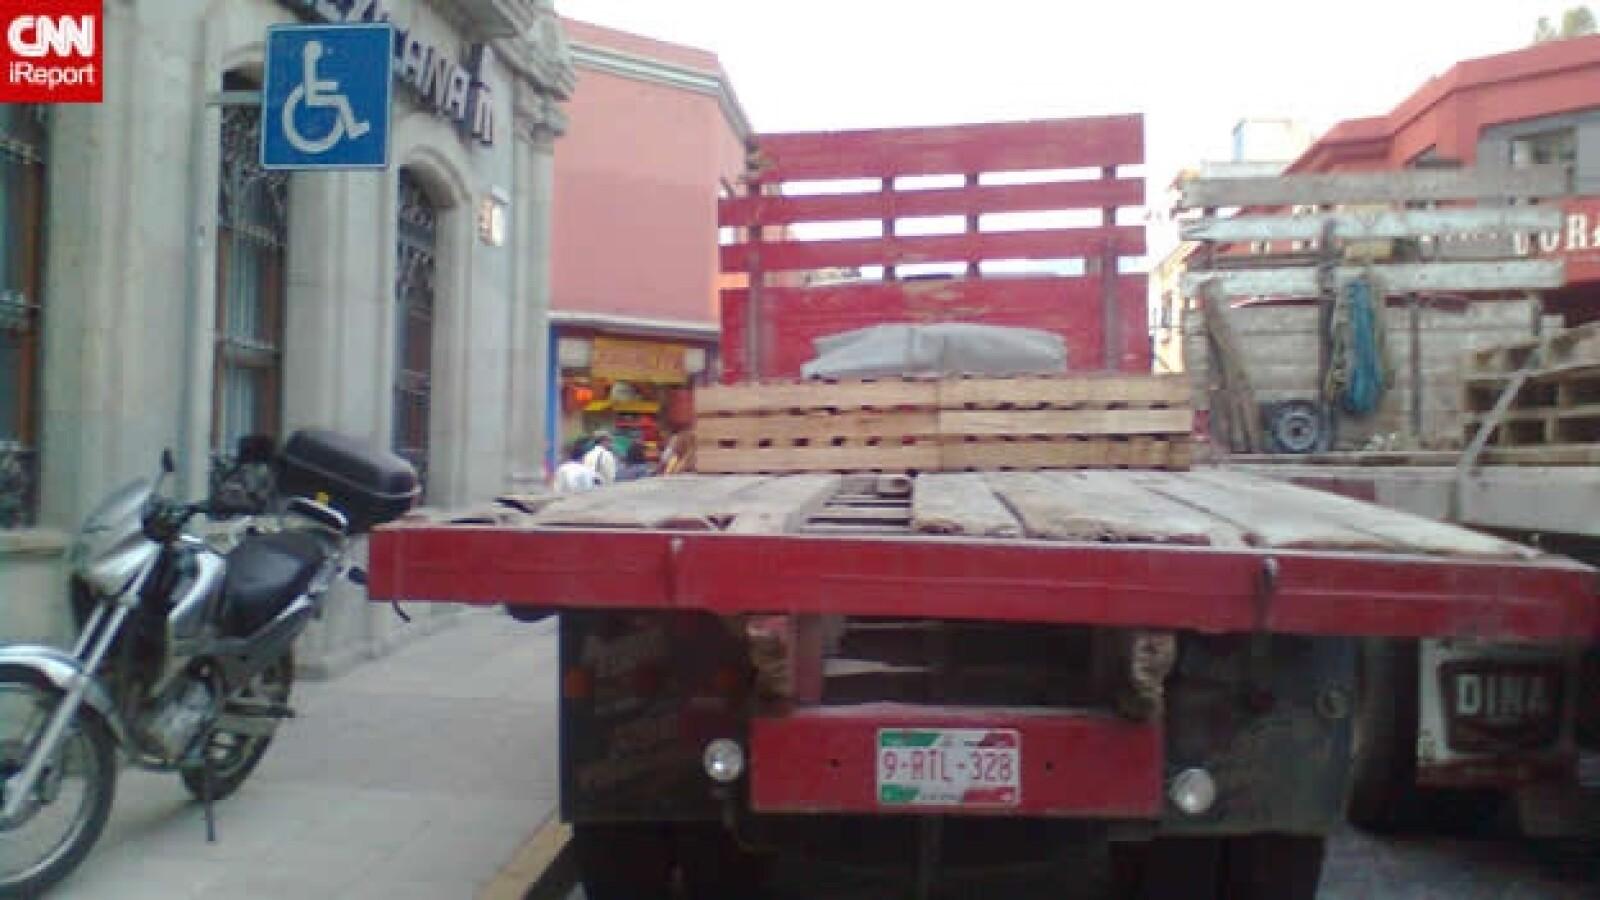 irpt-estacionamiento-oaxaca6